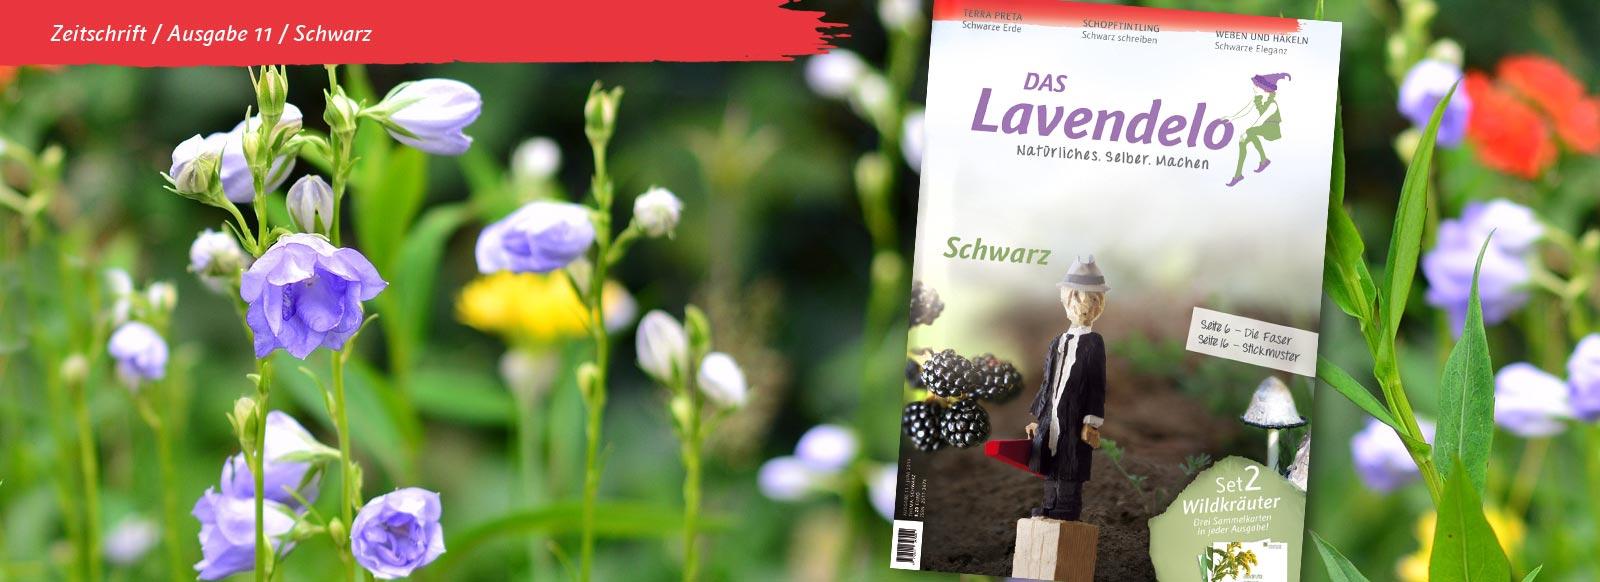 Das Lavendelo Ausgabe 11 Schwarz